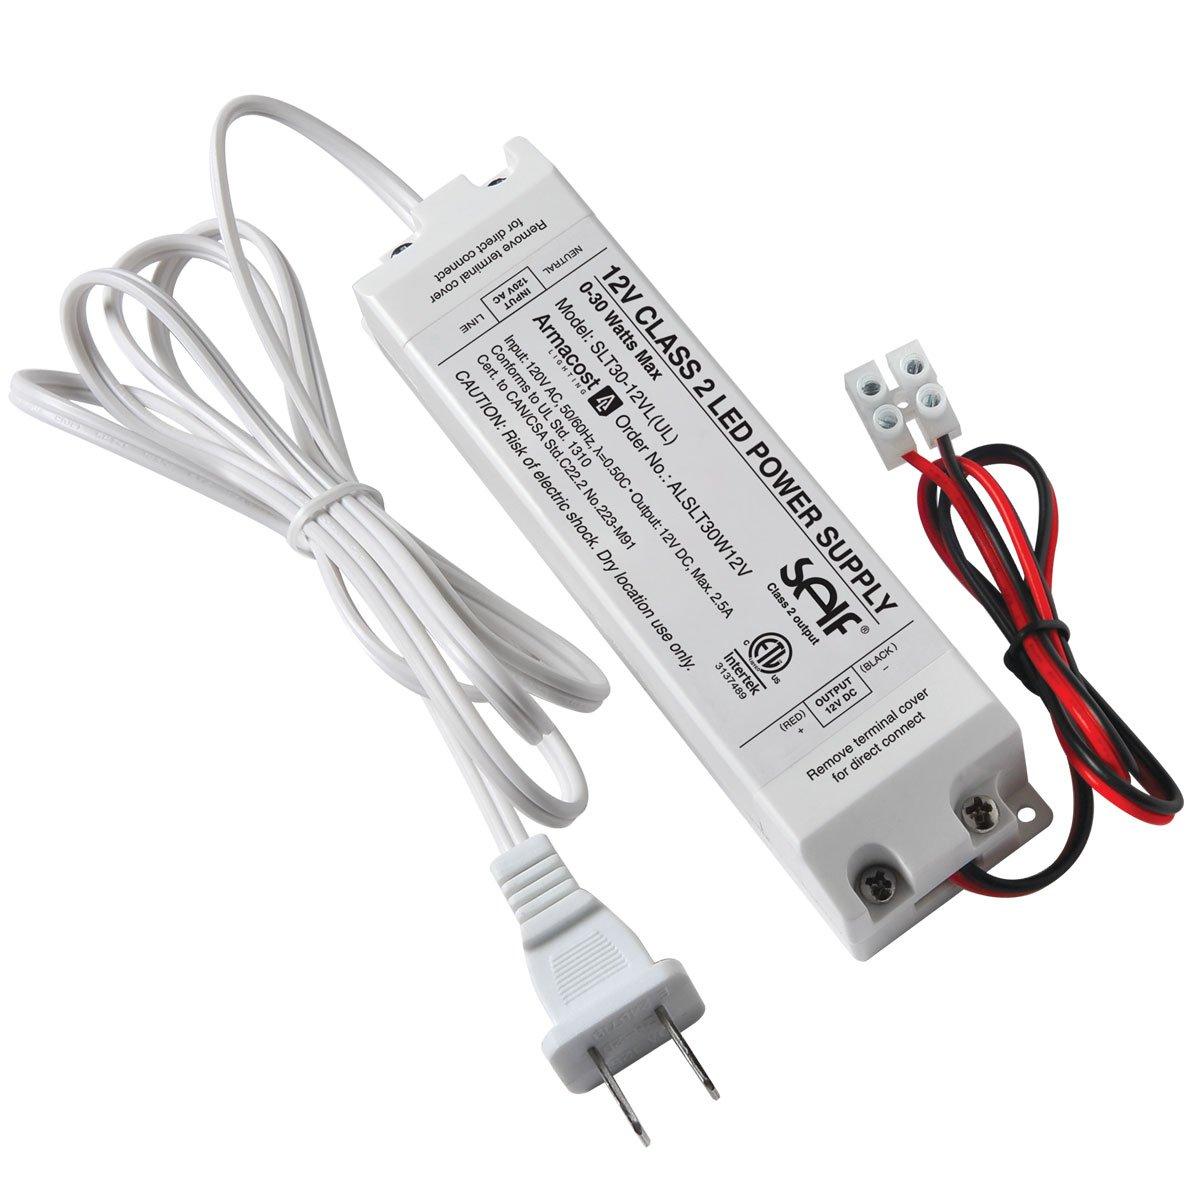 Armacost Lighting 810301 30W 12V Dc Led Lighting Power Supply